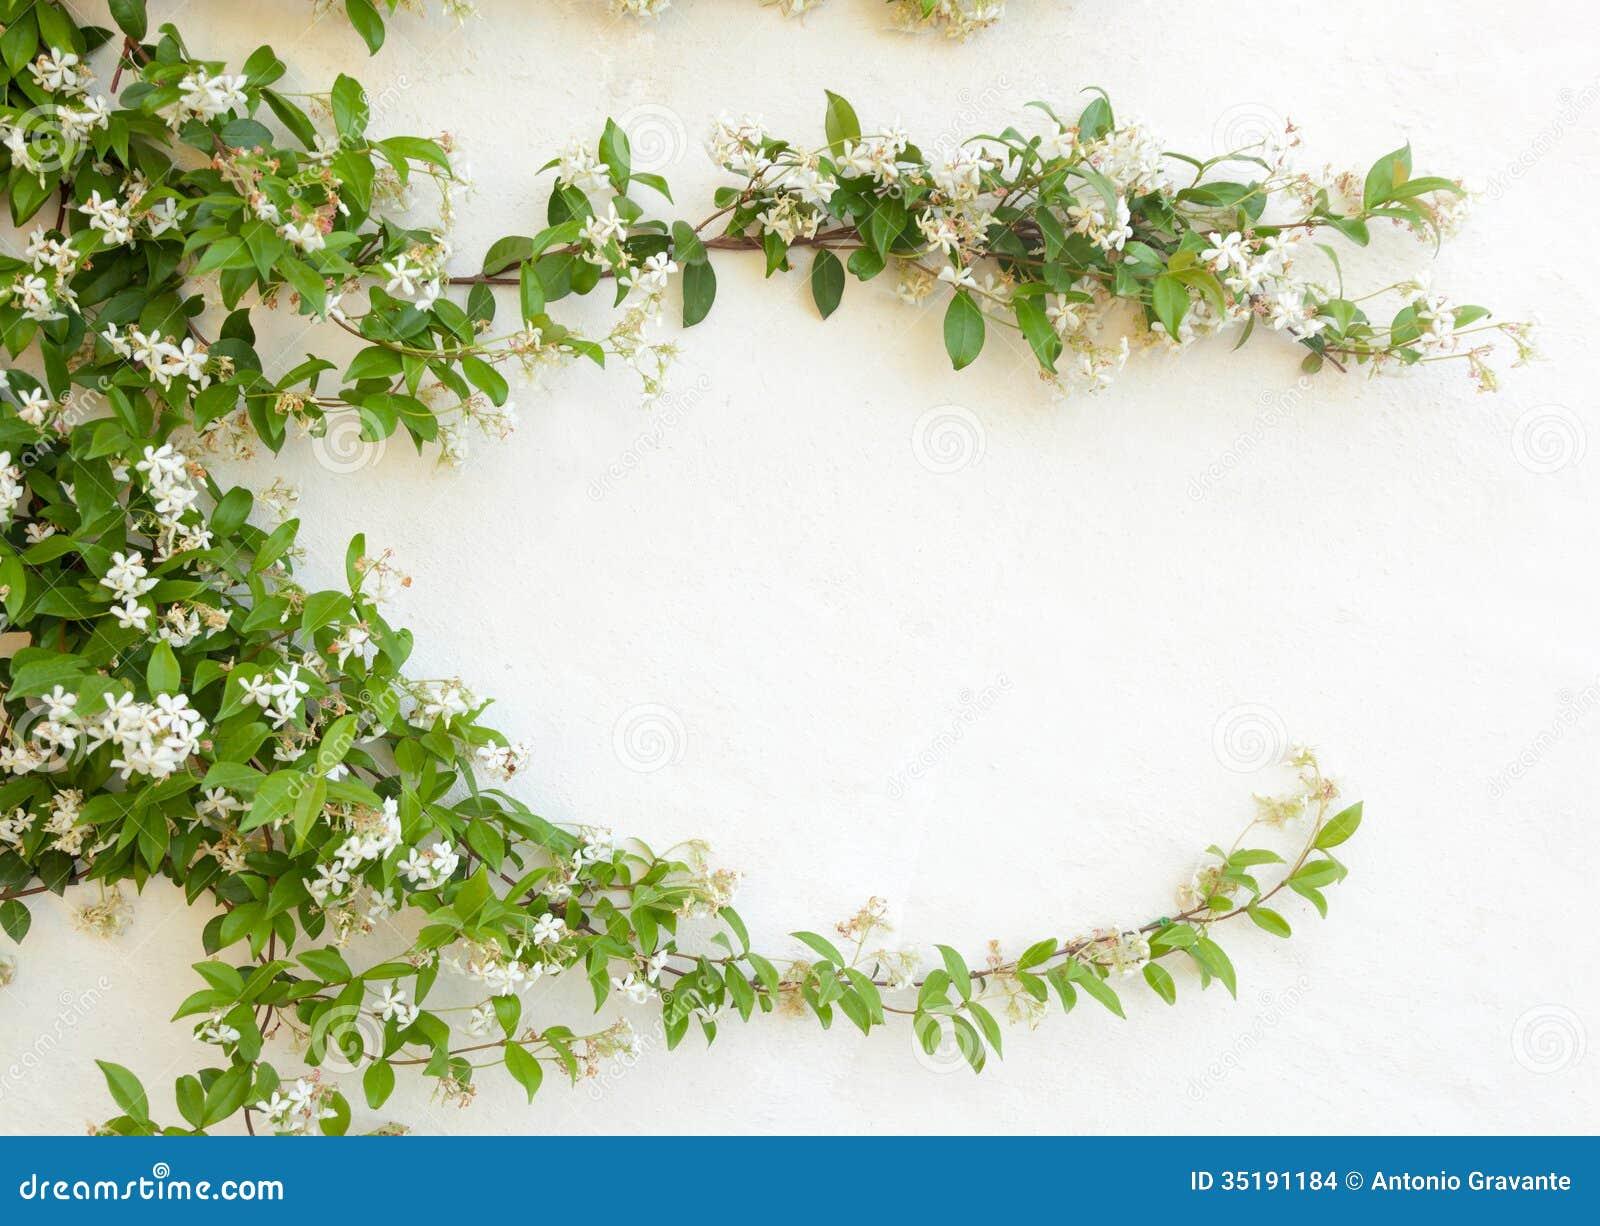 Natural frame of jasmine flowers on white wall stock photo image royalty free stock photo izmirmasajfo Gallery